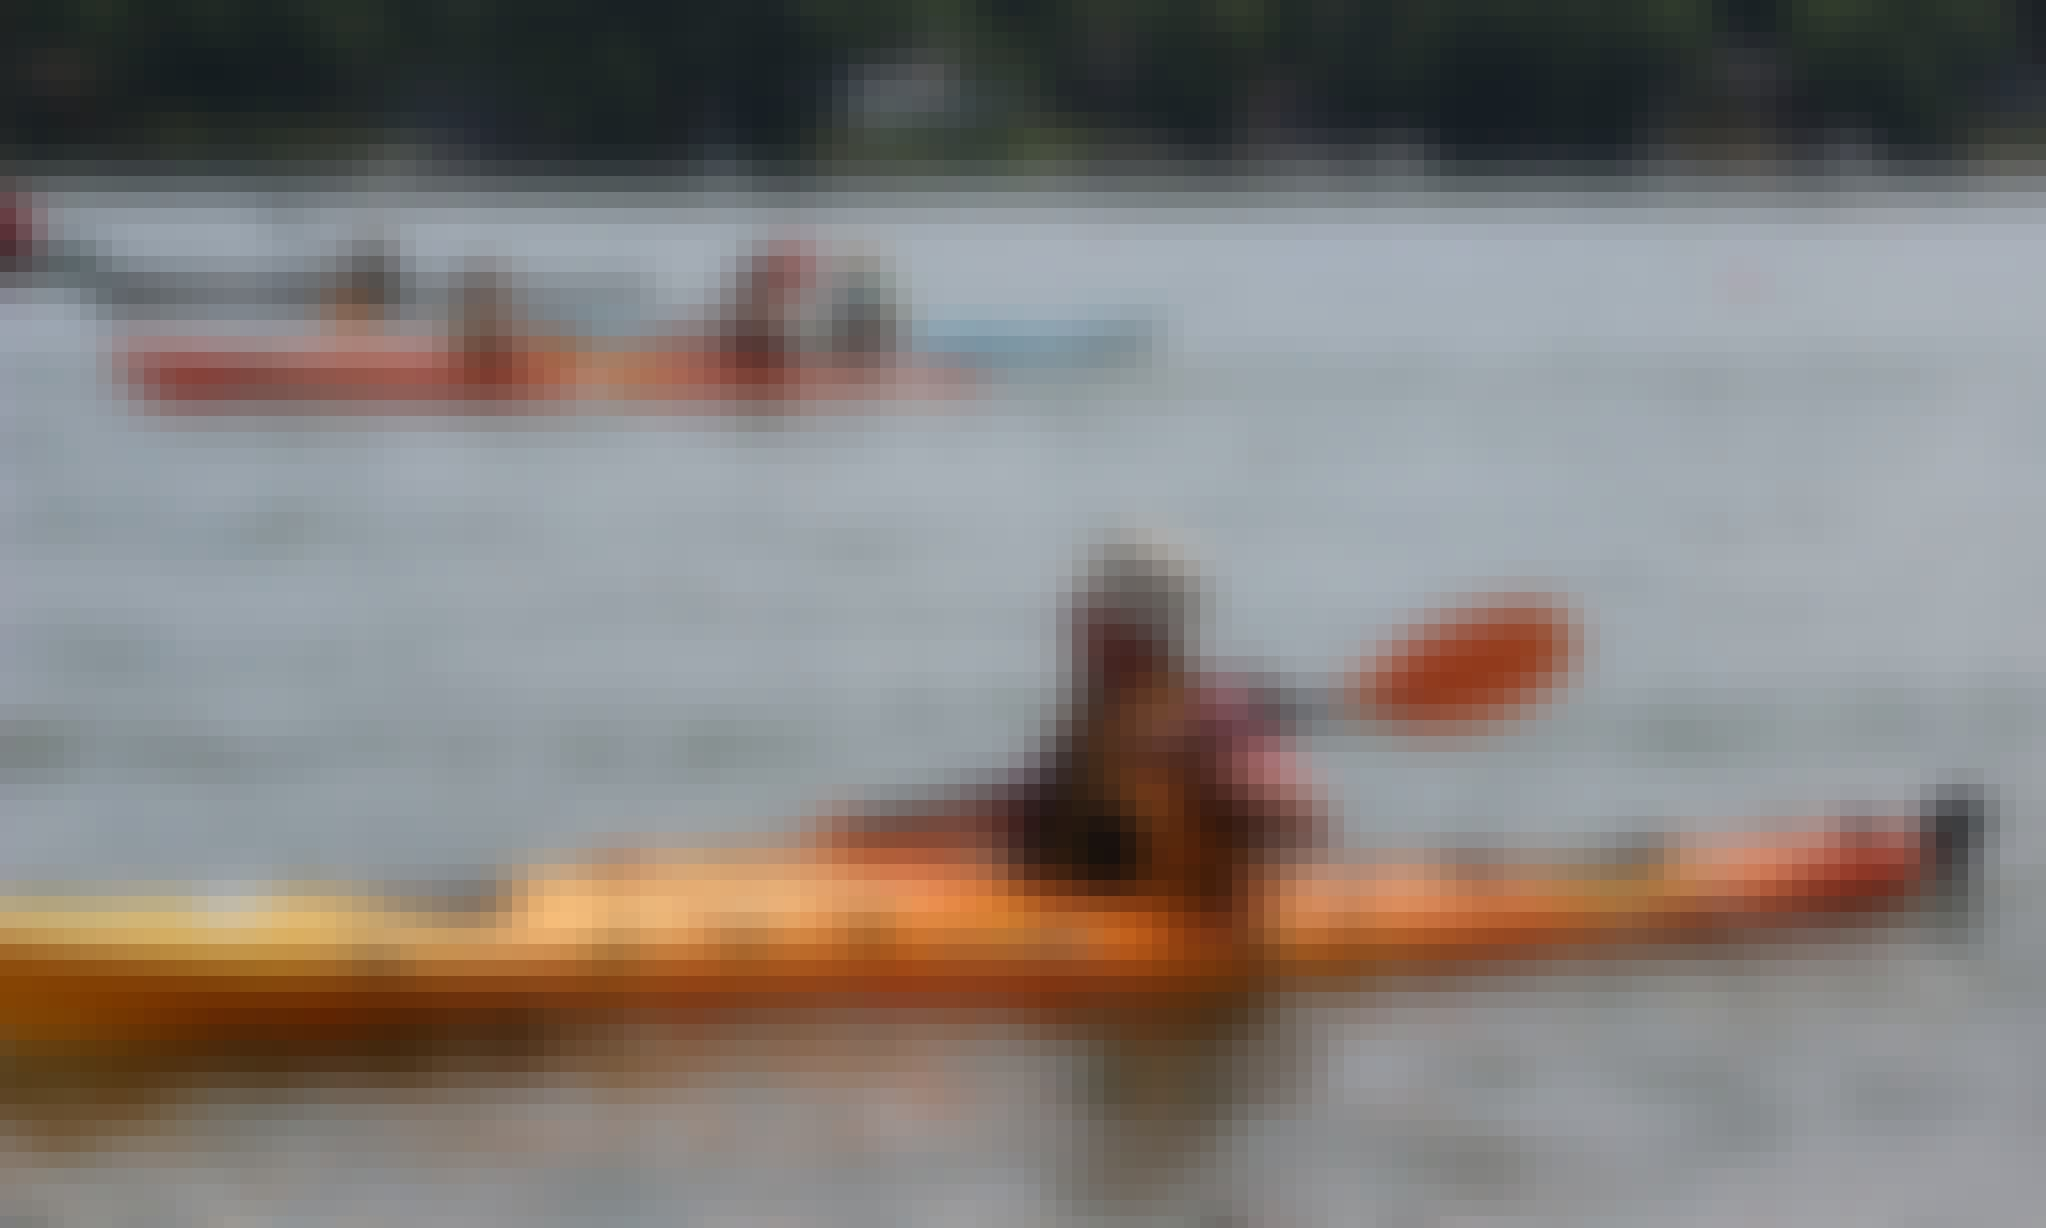 Single Kayaks Rentals in West Bath